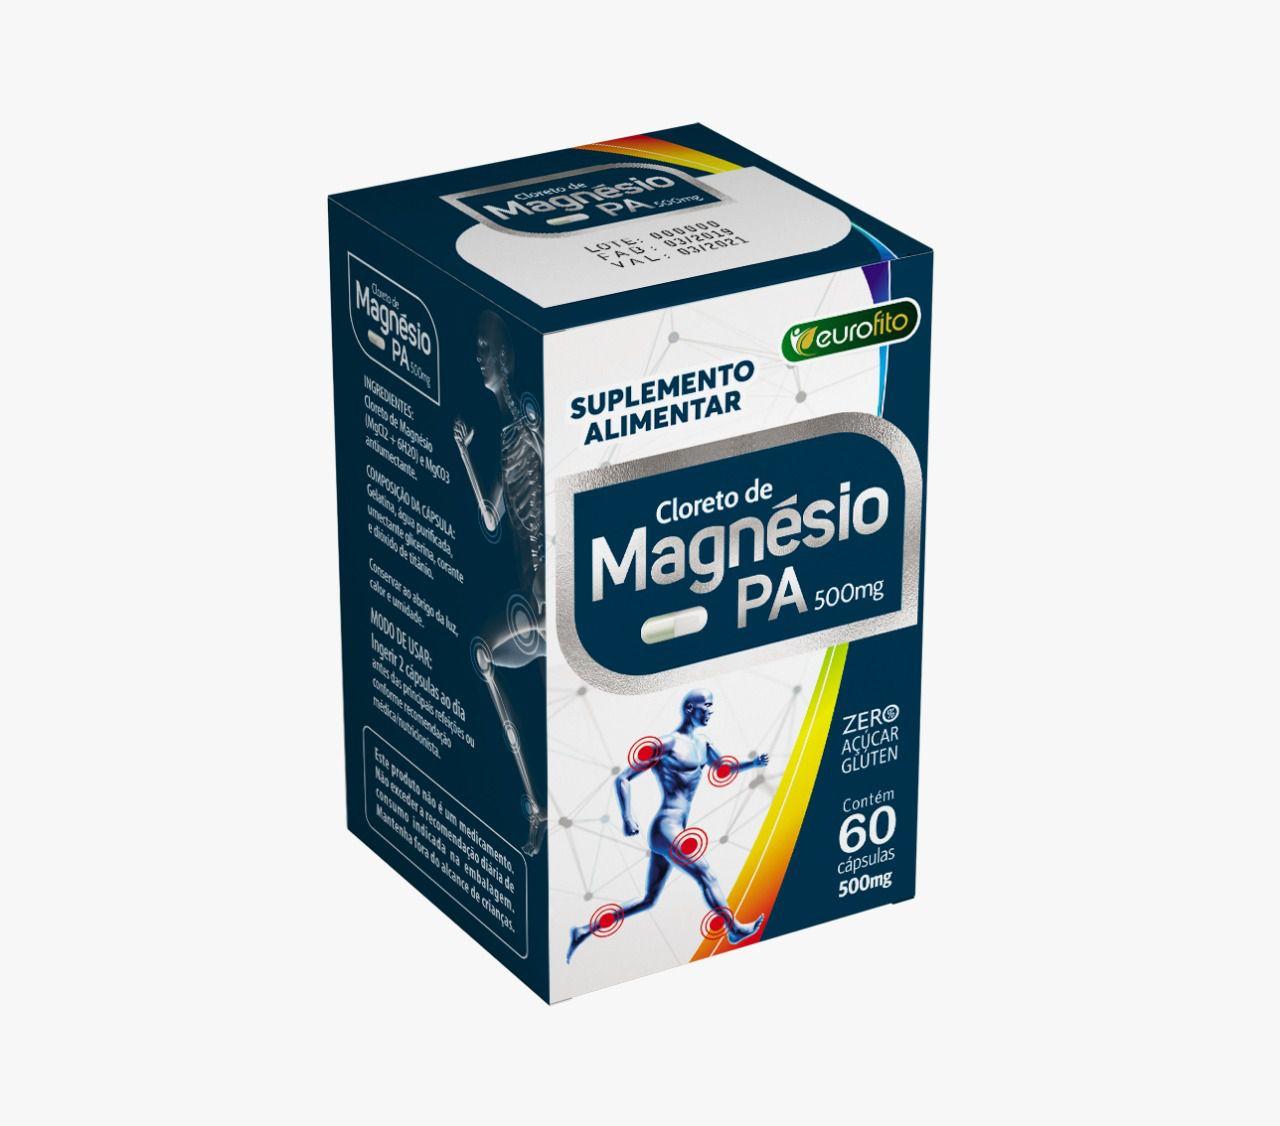 Cloreto de Magnésio PA 500mg - 60 cápsulas- Eurofito